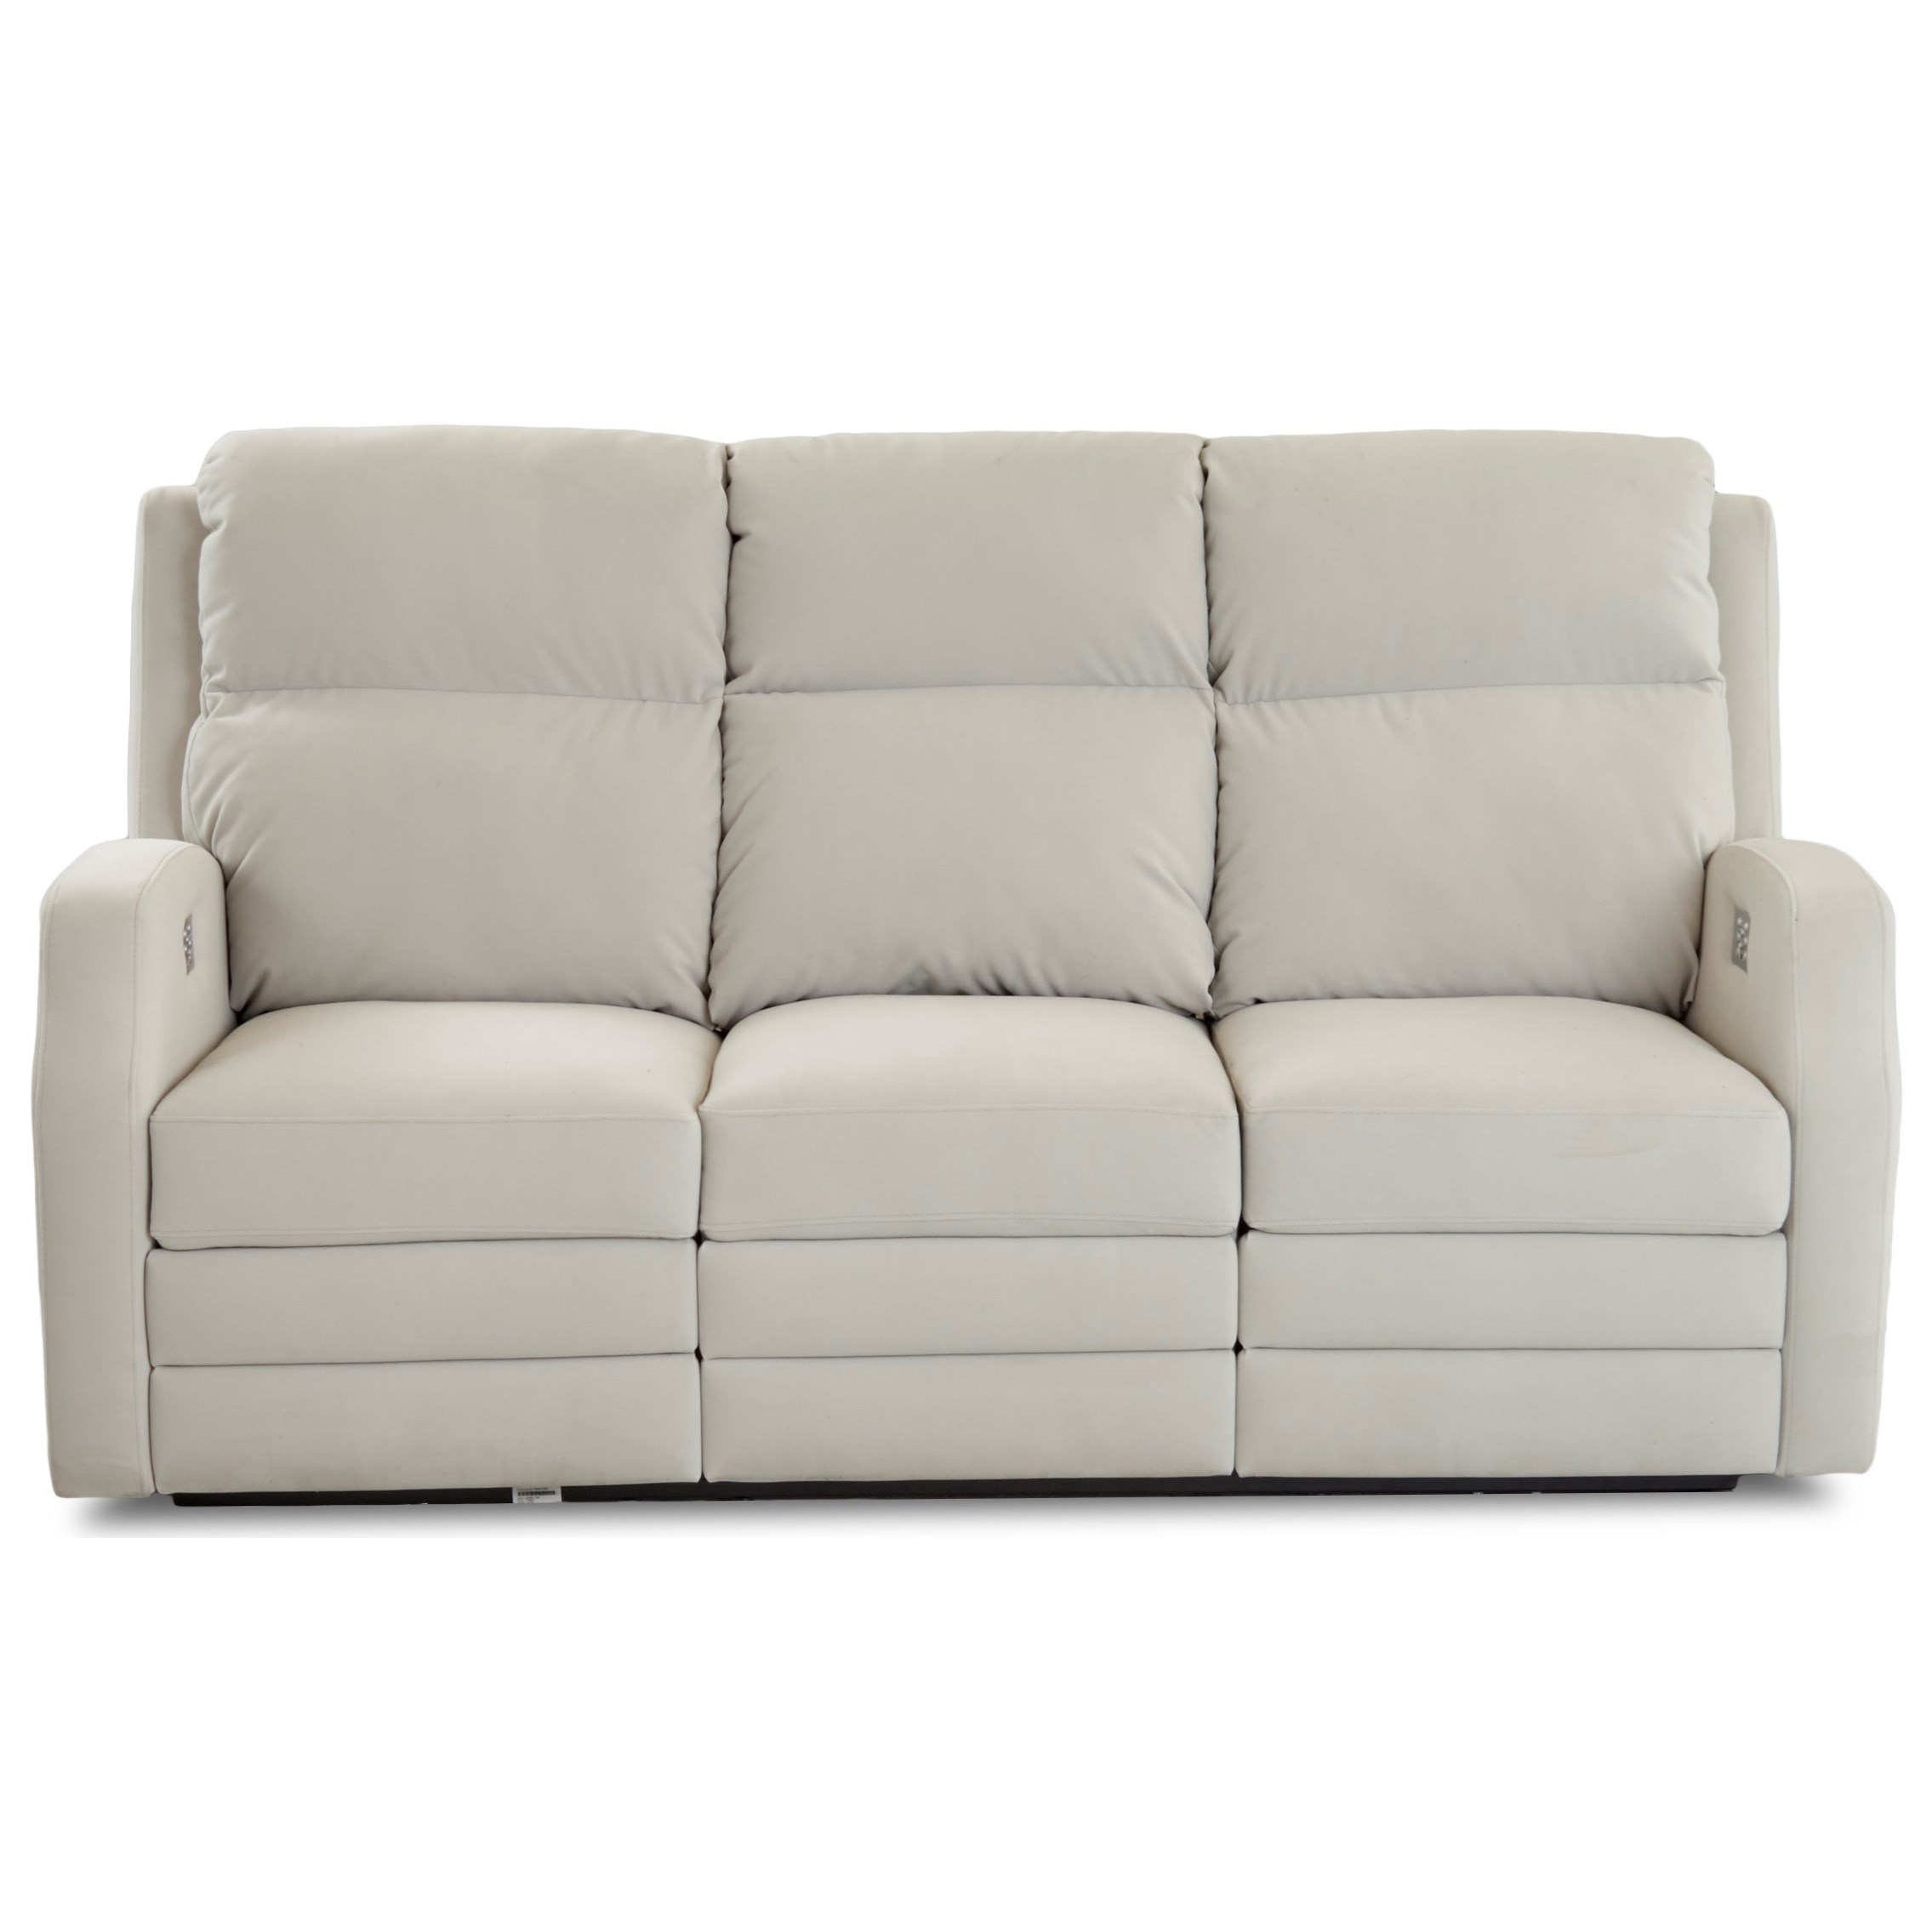 Power Reclining Sofa w/ Pwr Head/Lumbar